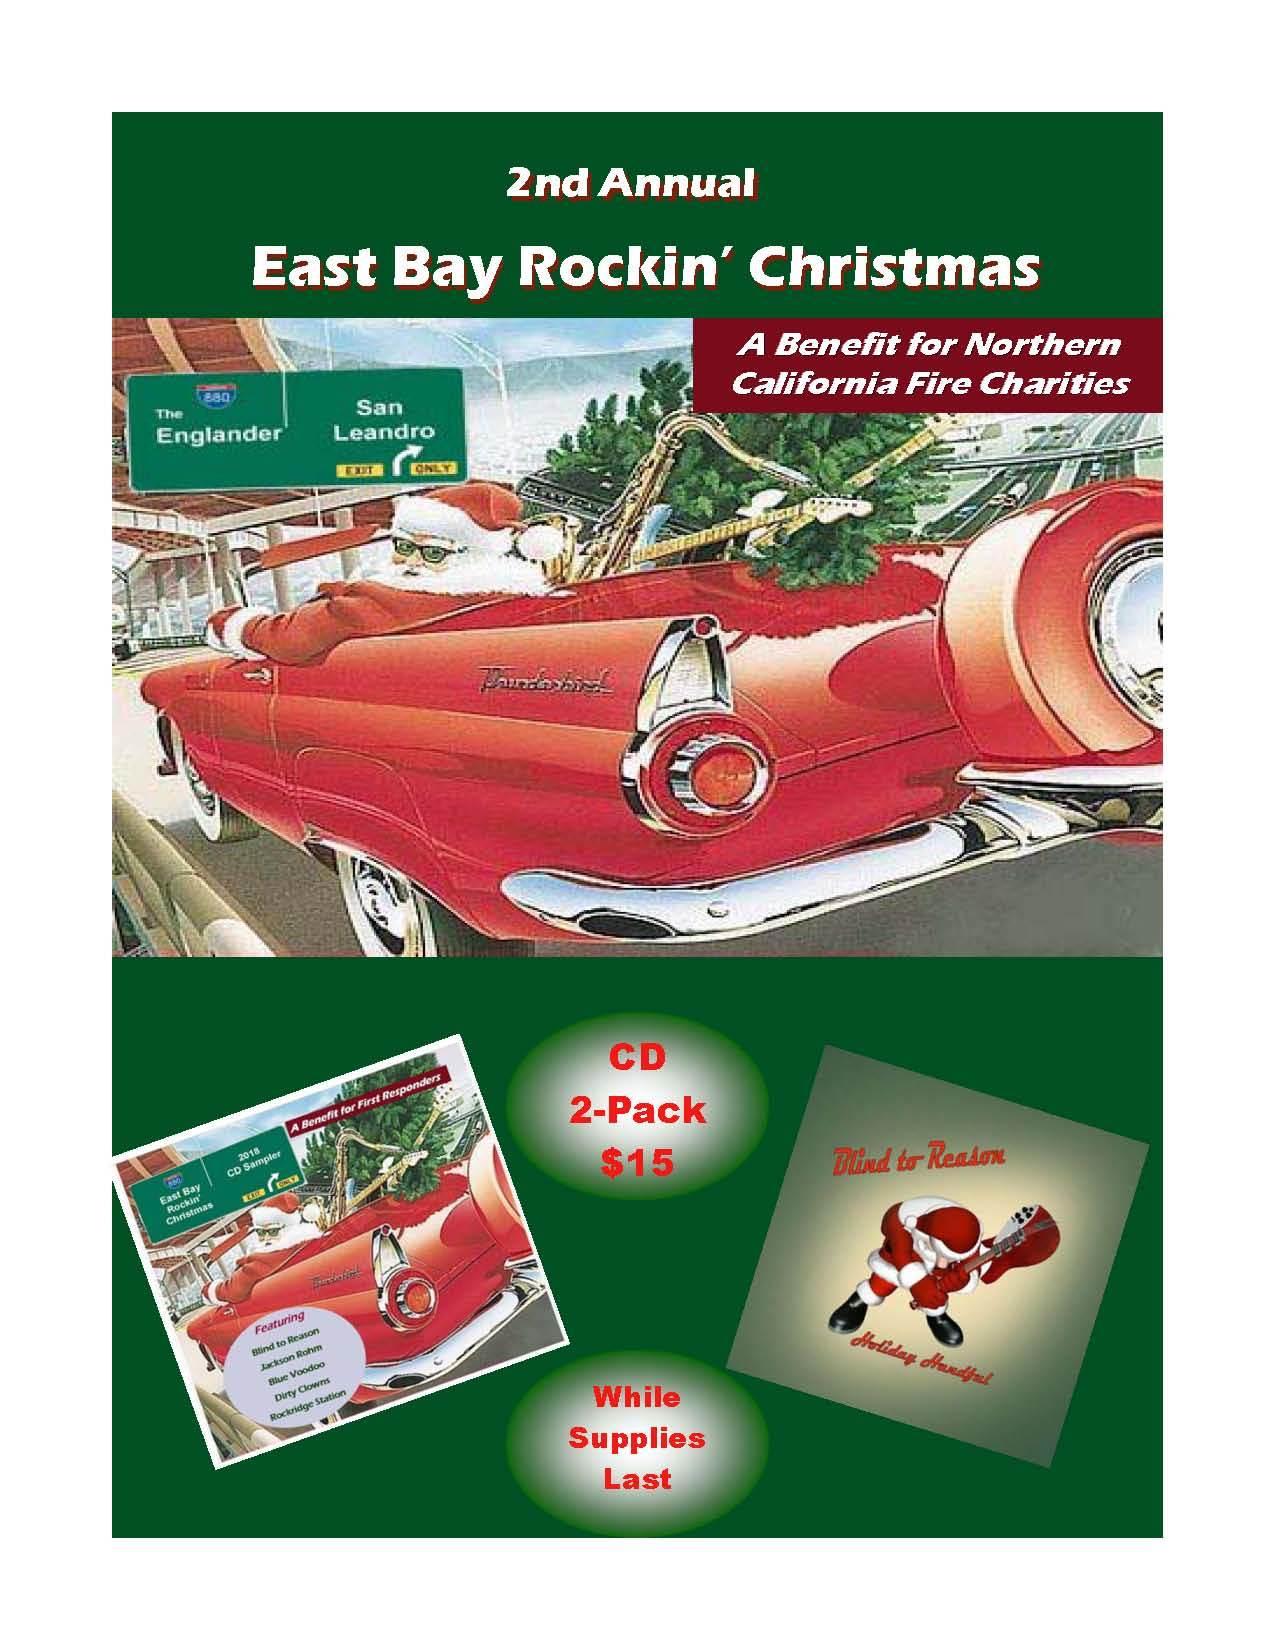 East Bay Rockin Christmas CD 2-Pack 00001